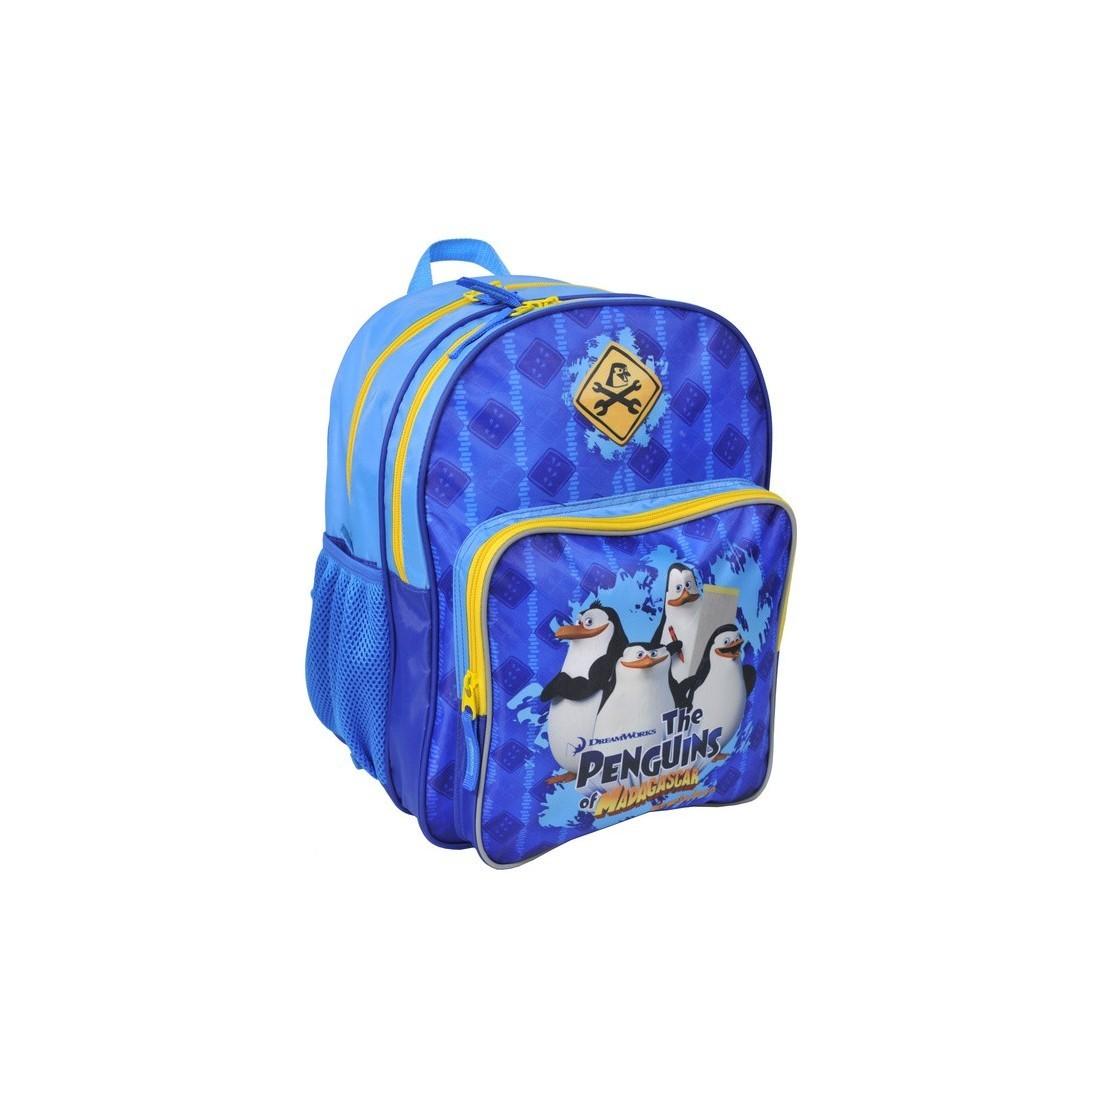 Plecak szkolny Pingwiny z Madagaskaru niebieski - plecak-tornister.pl